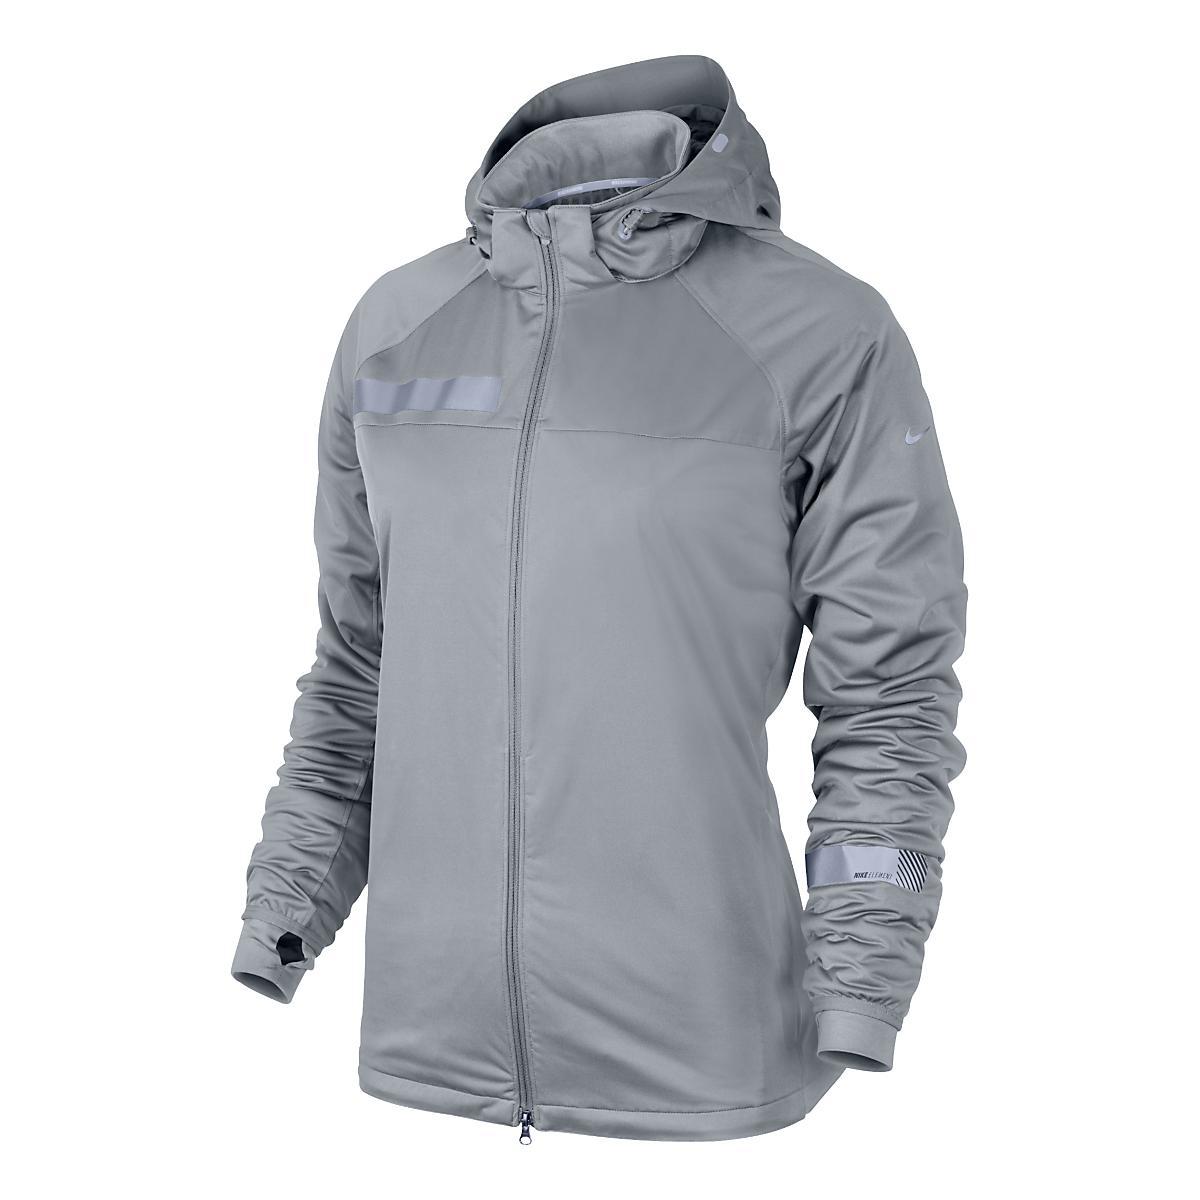 d244e235e8c5 Womens Nike Element Shield Max Running Jackets at Road Runner Sports